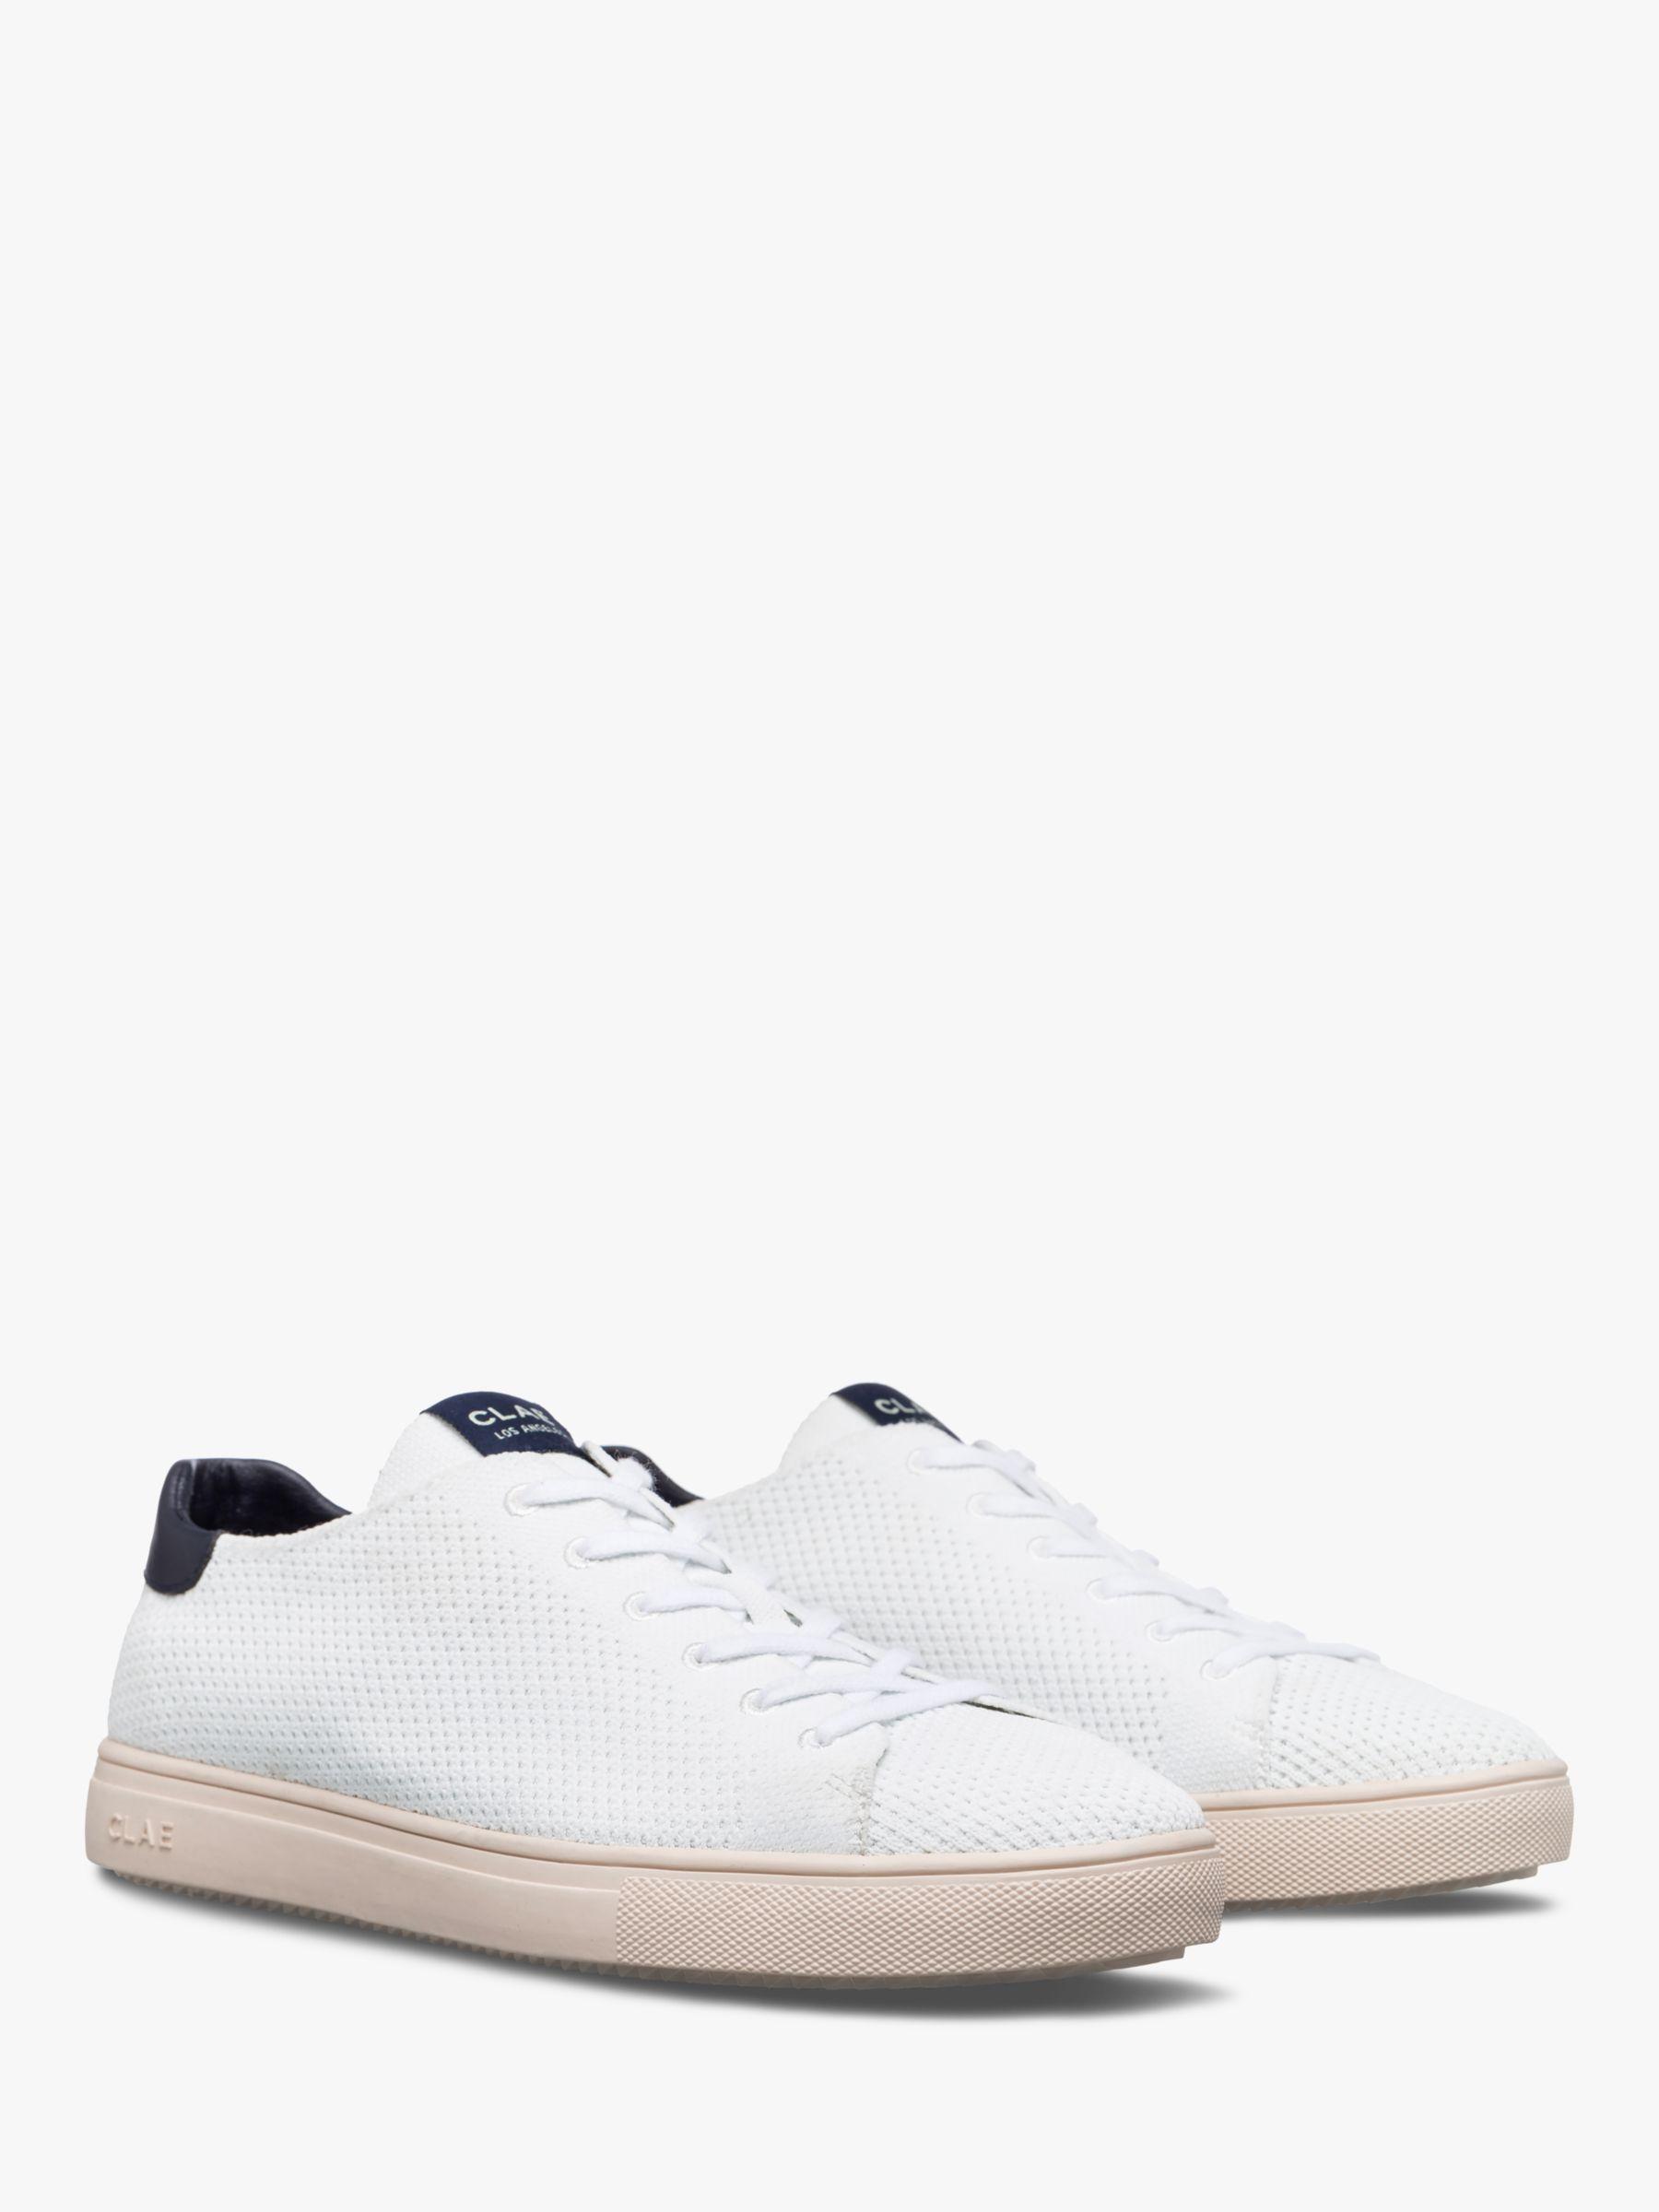 Clae CLAE Bradley Knit Trainers, White/Navy